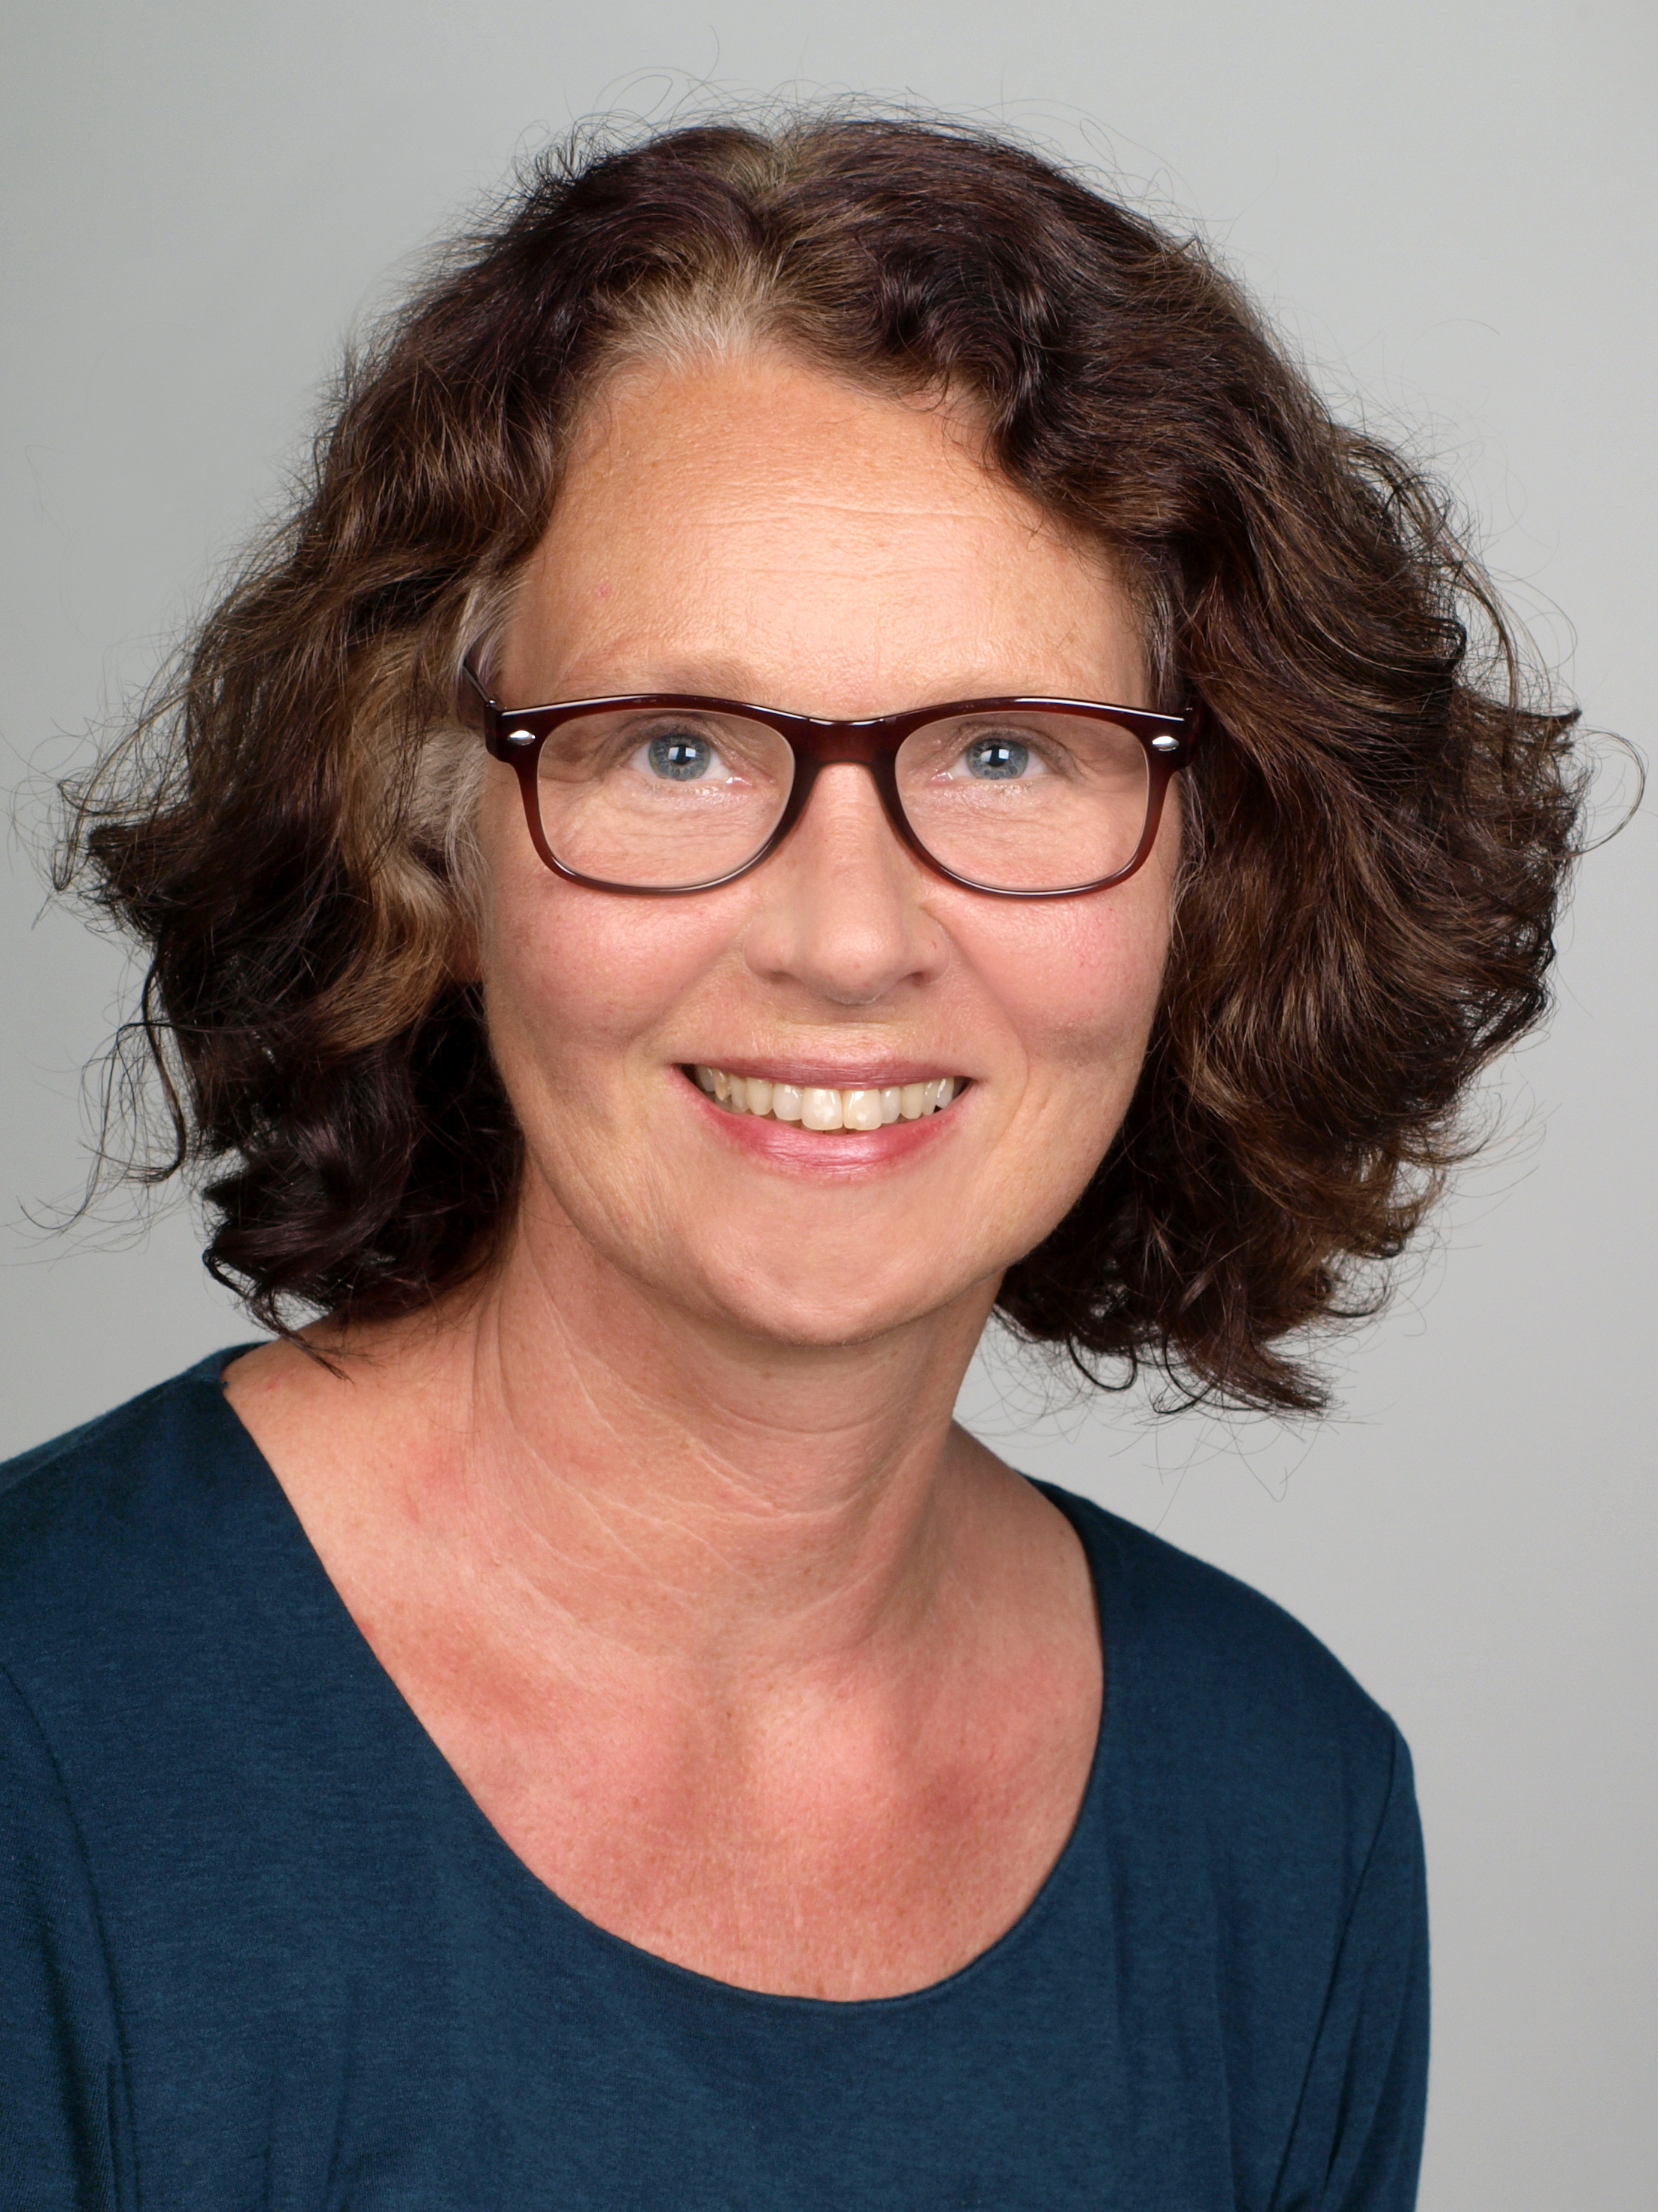 Ursula Peveling